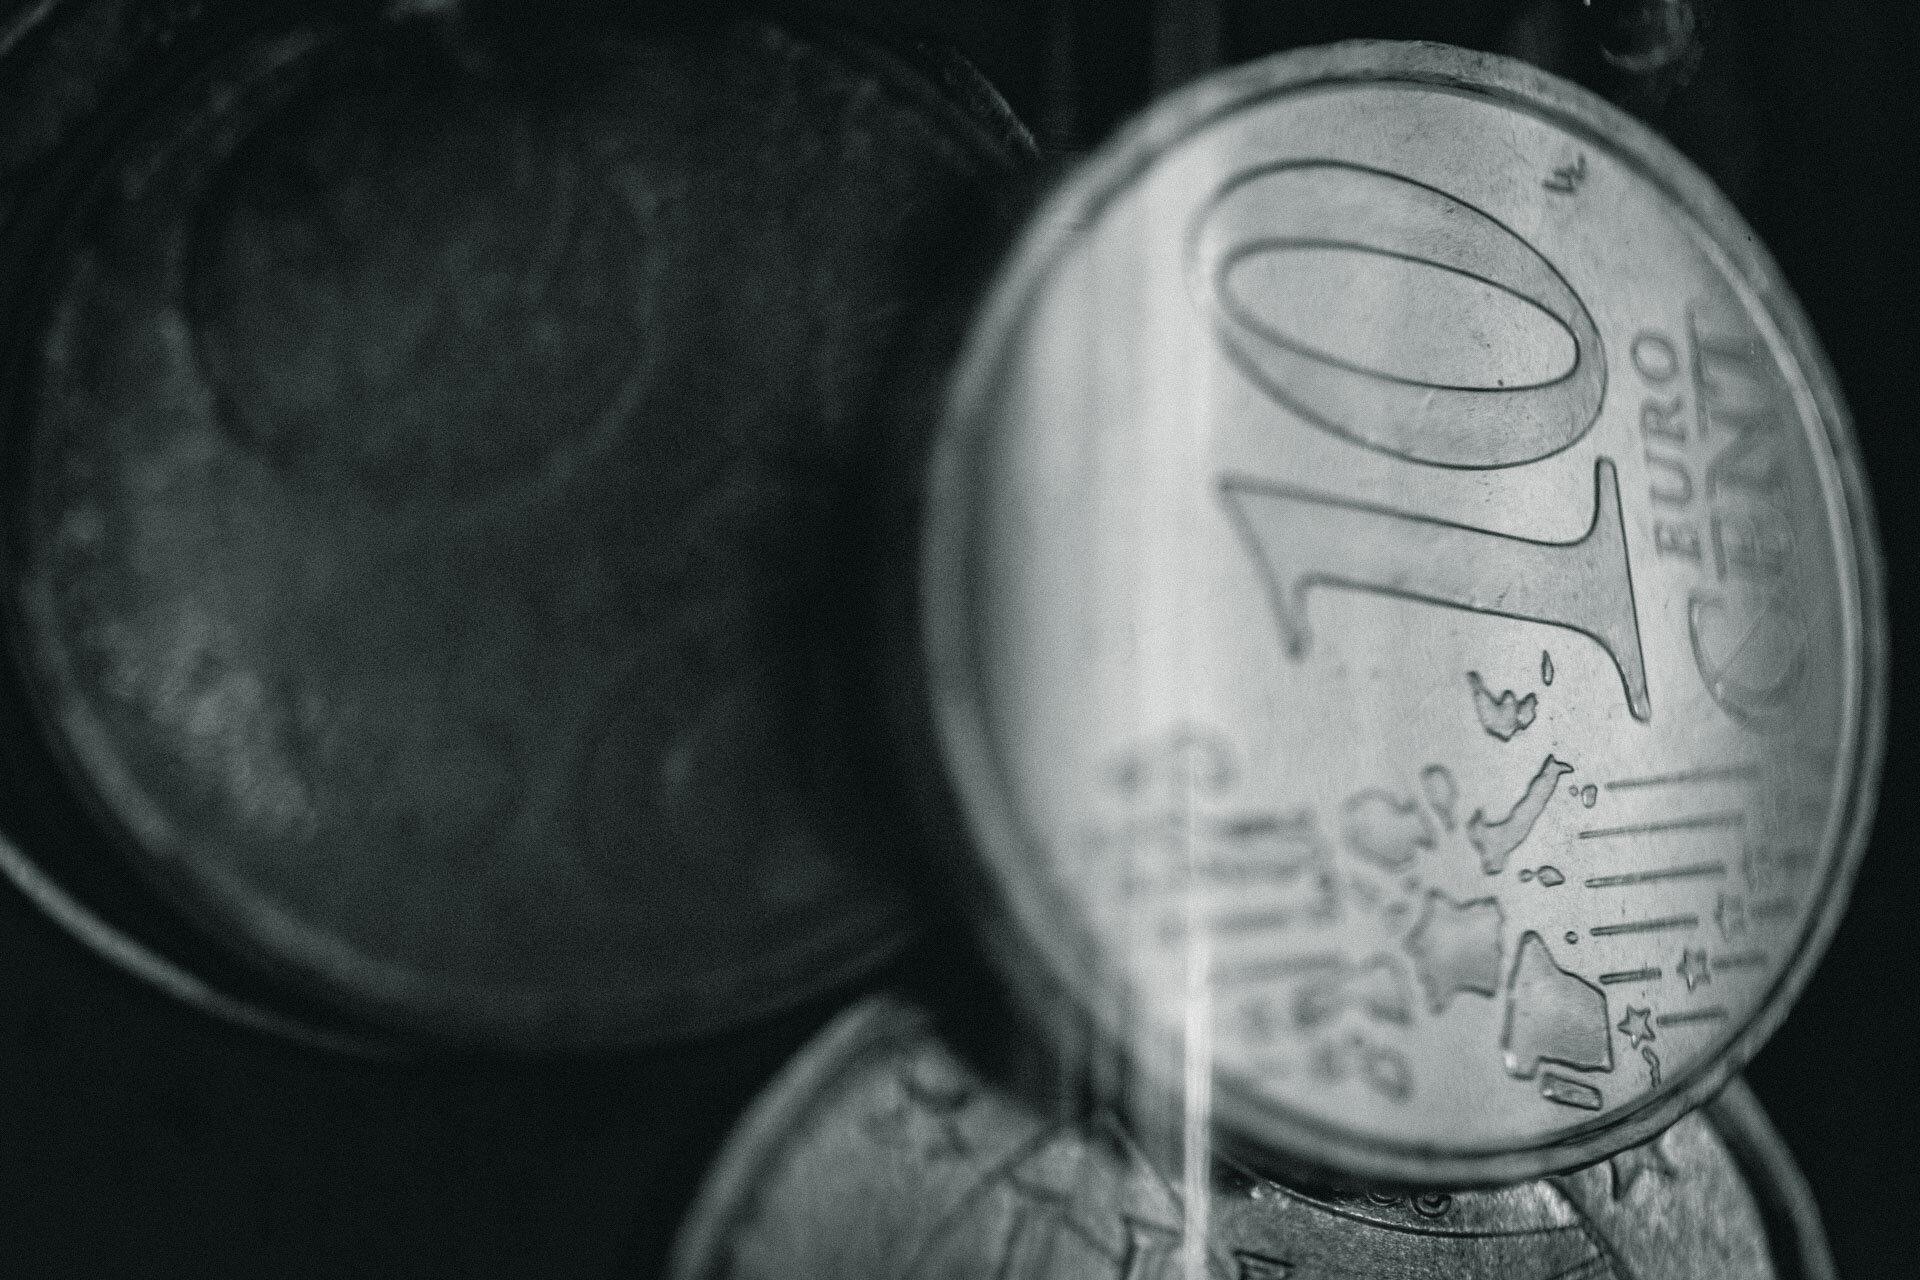 BPP 12 - Coins - IG-2.jpg